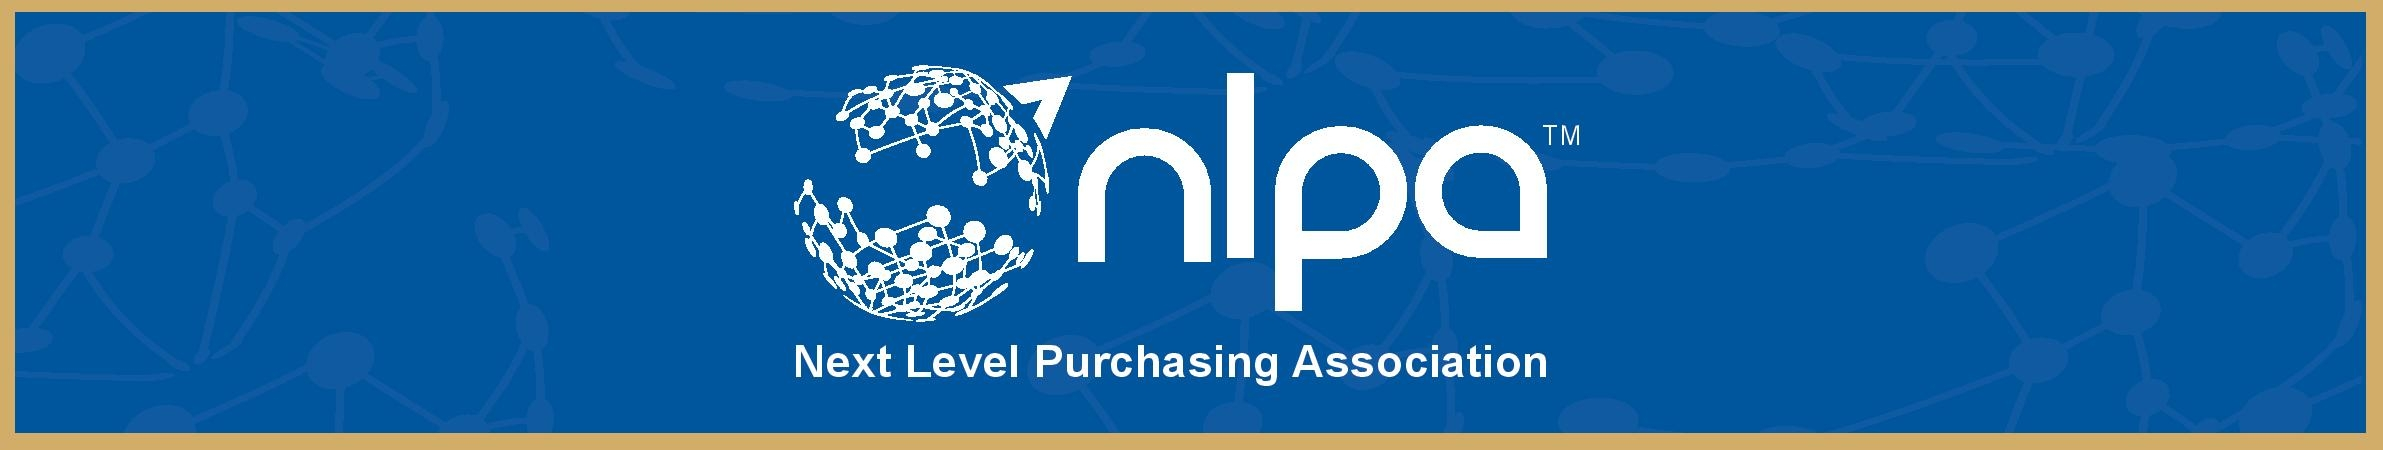 Next Level Purchasing (@nextlevelpurchasing) Cover Image